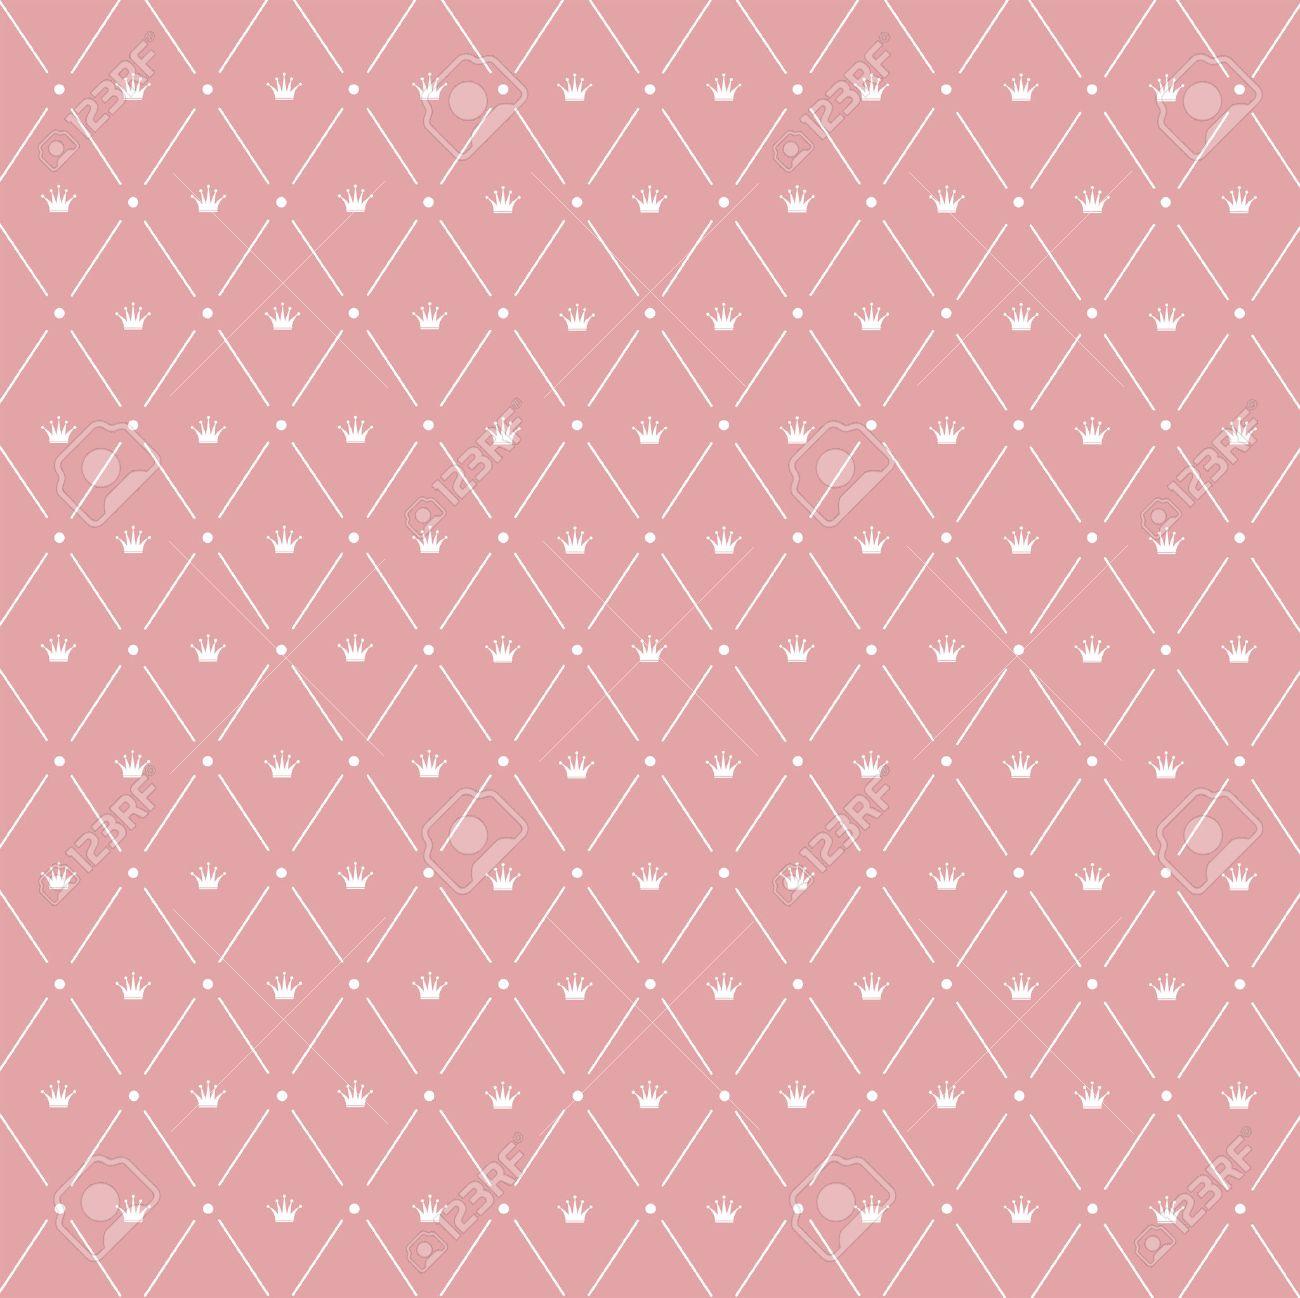 Seamless Pattern Crown Symmetrically Arranged Between Diagonal